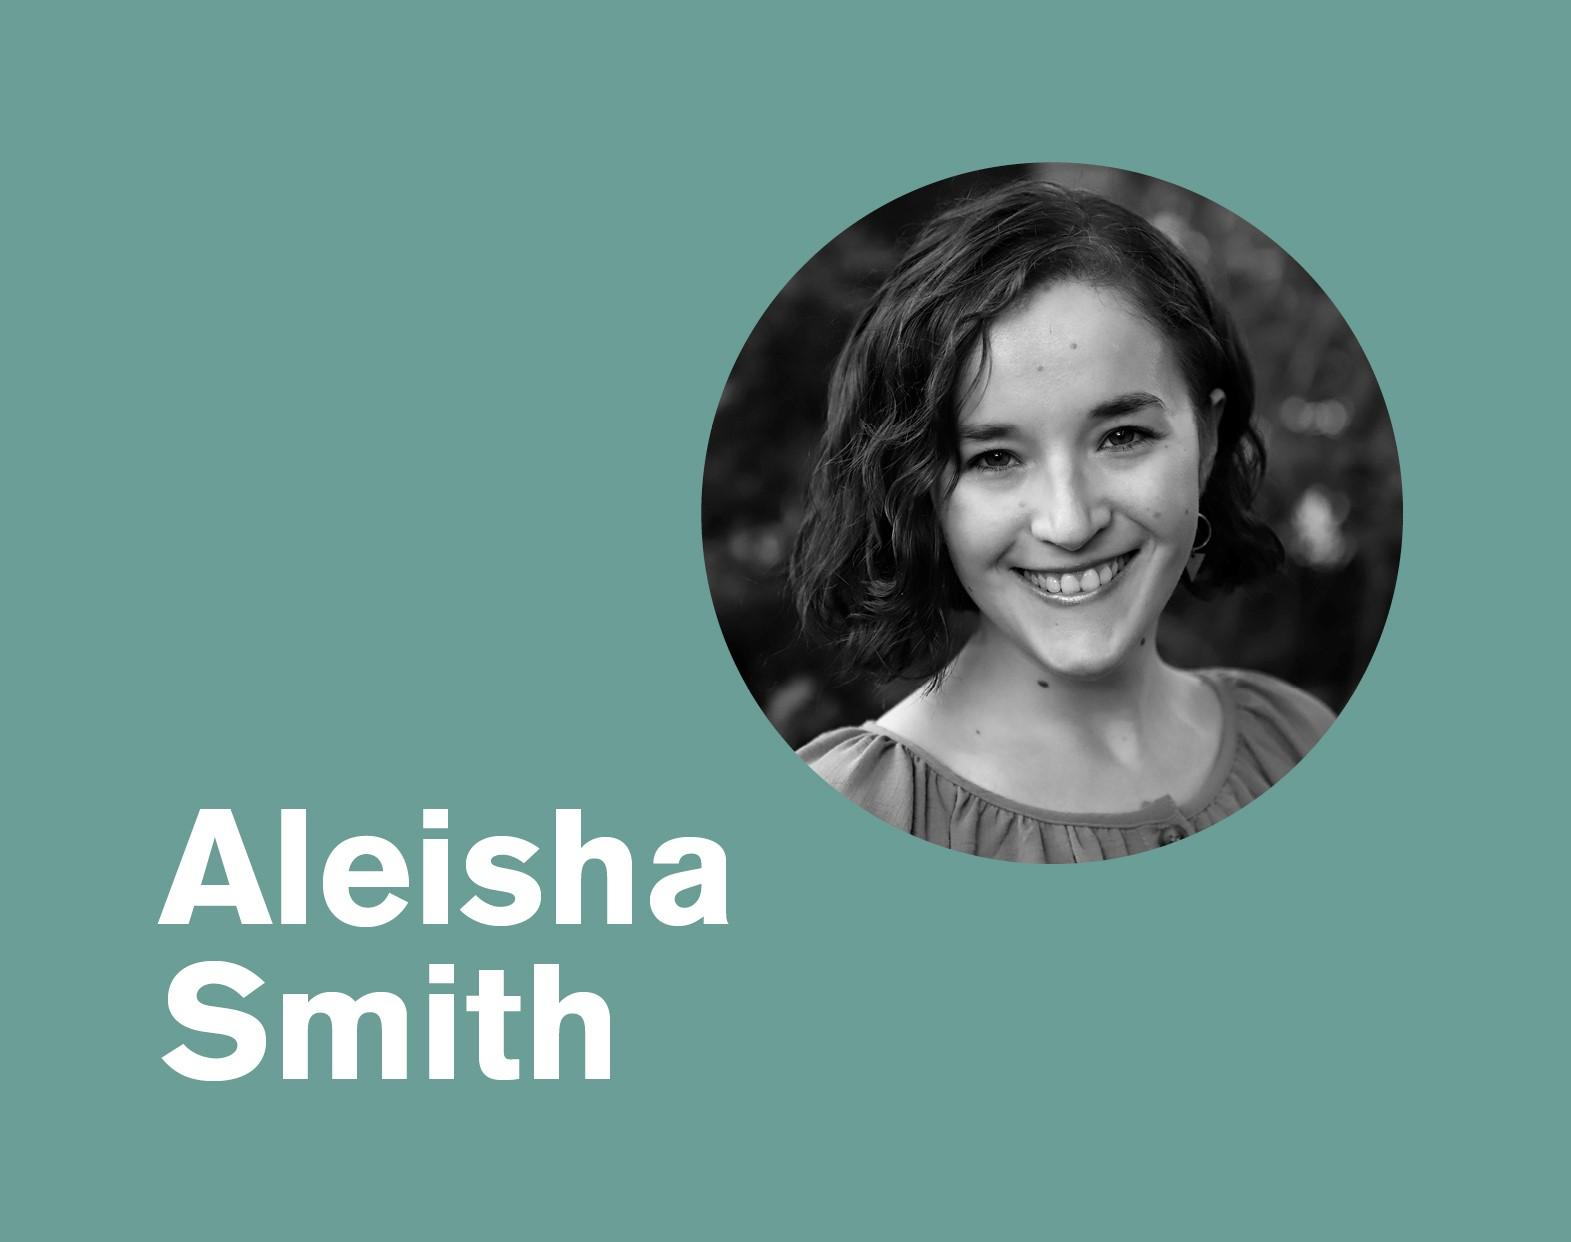 Aleisha Smith